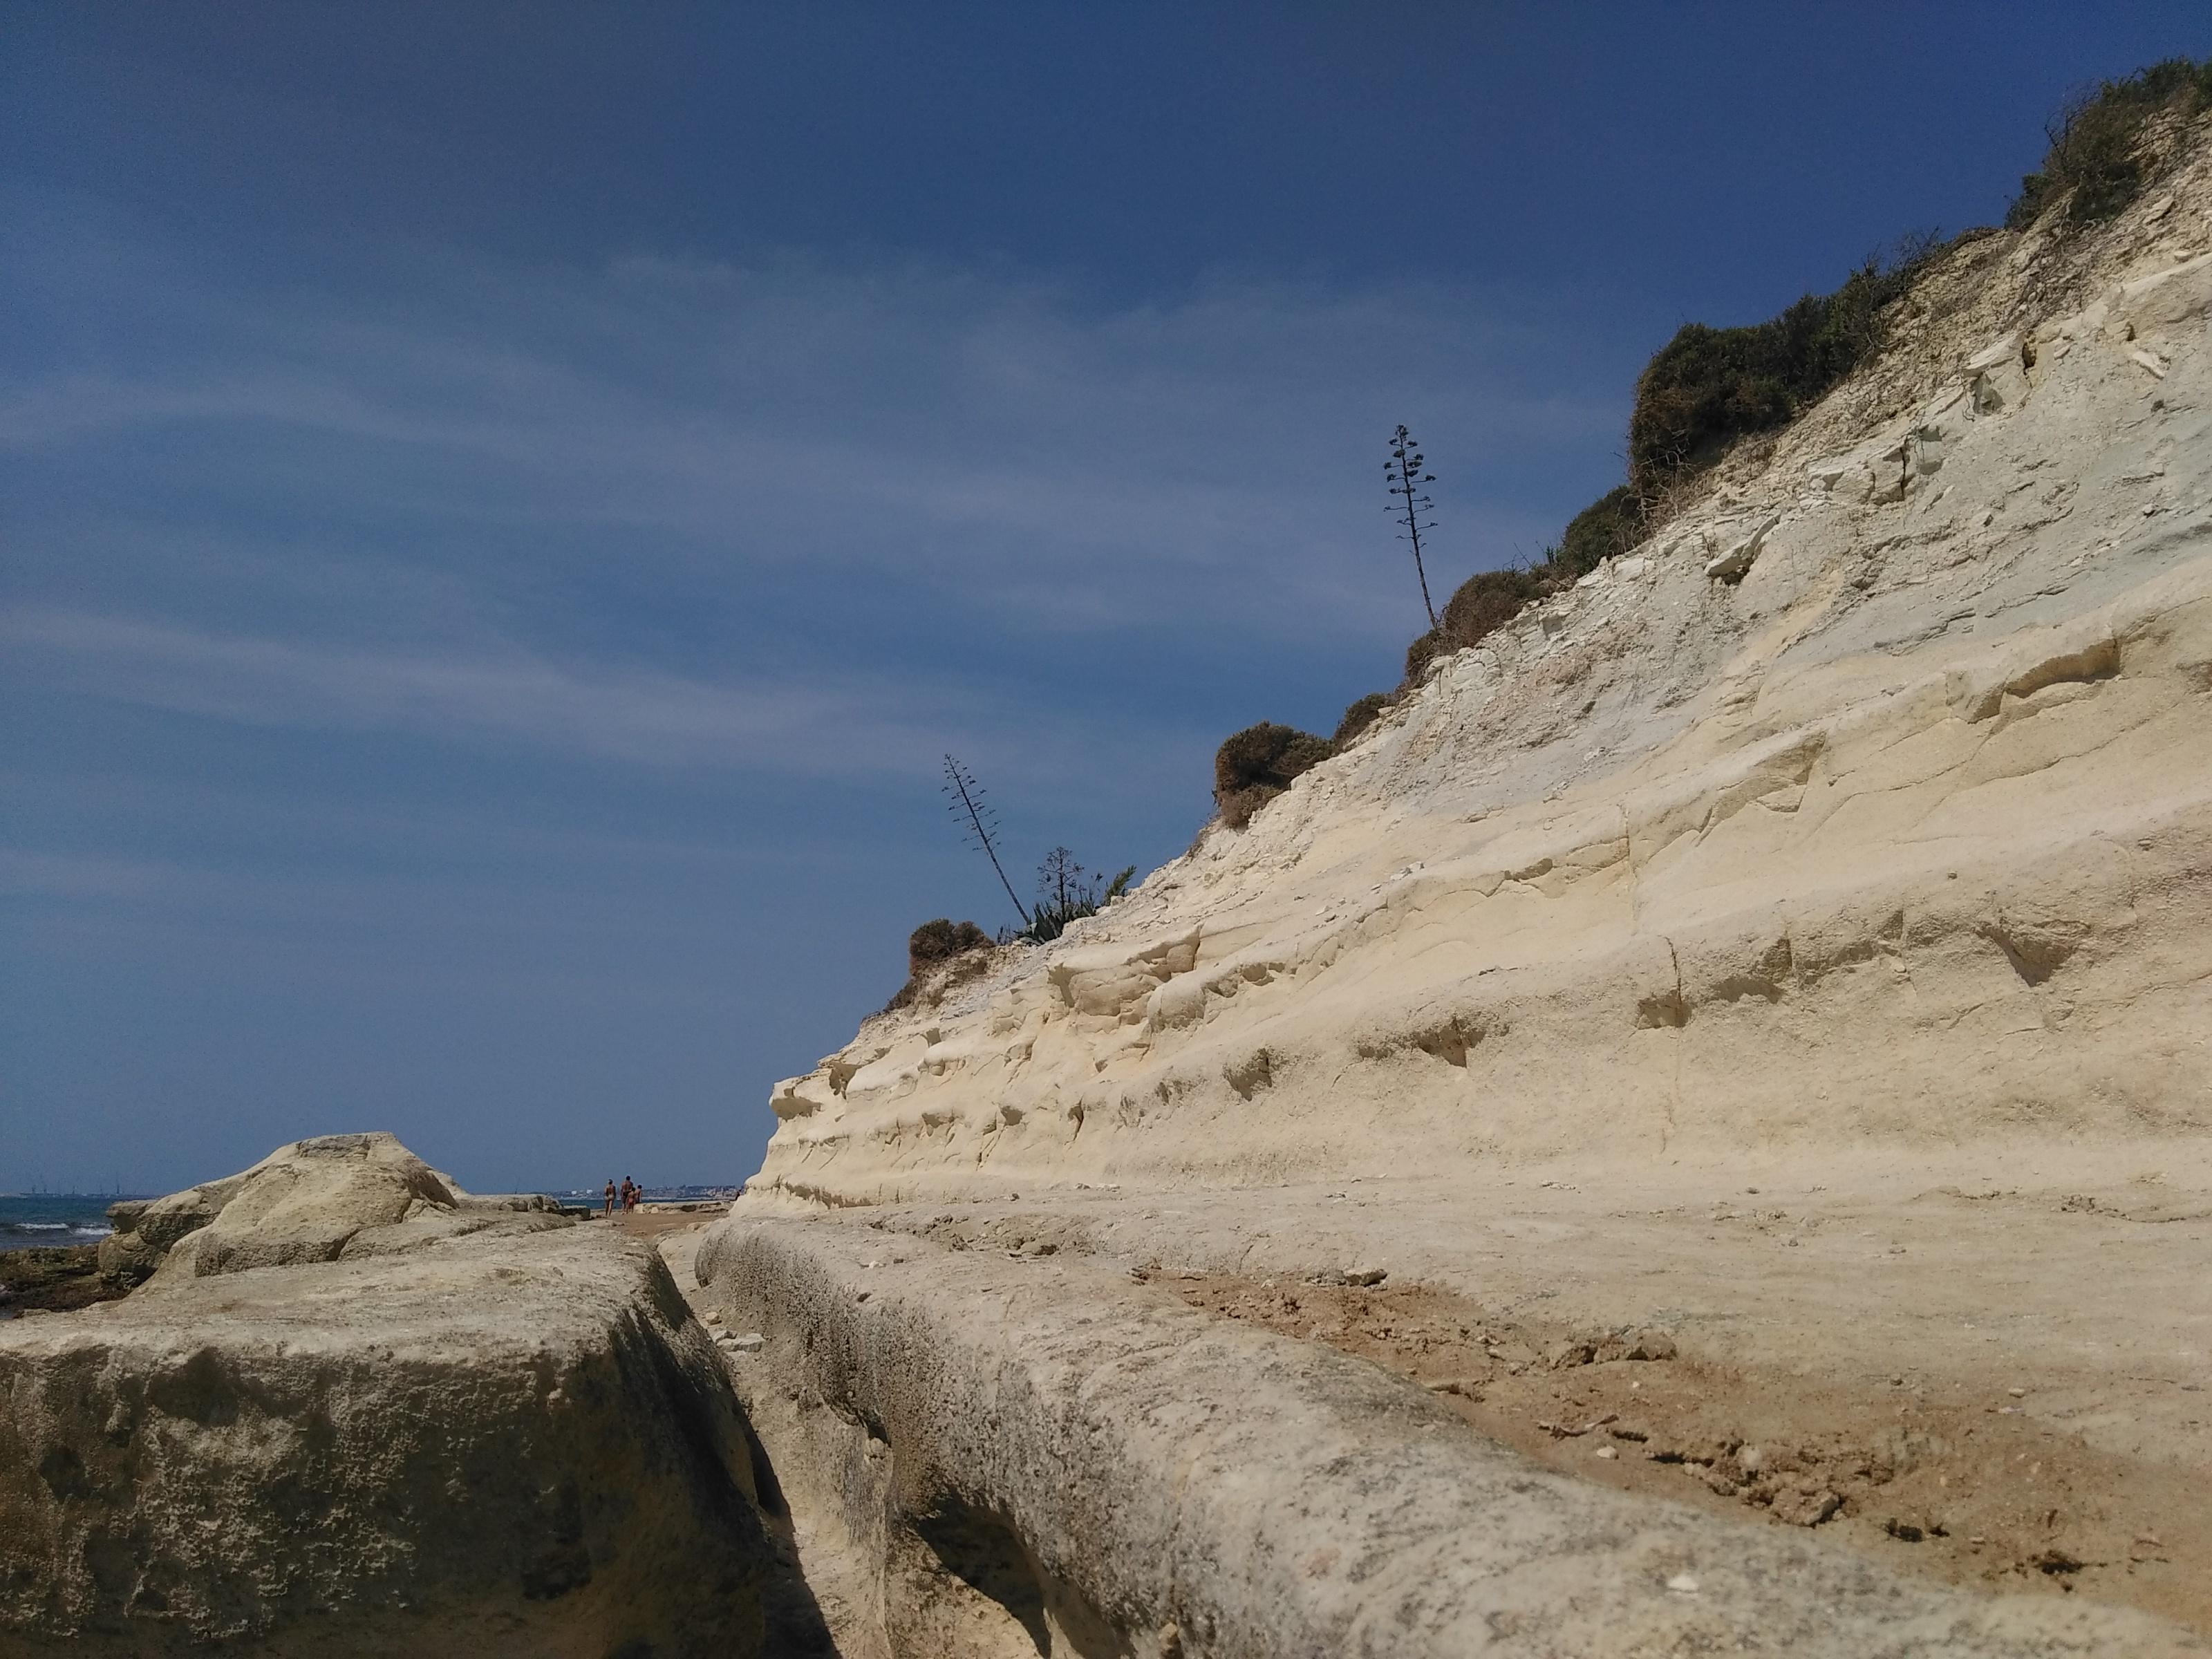 Creta di Punta Cirica